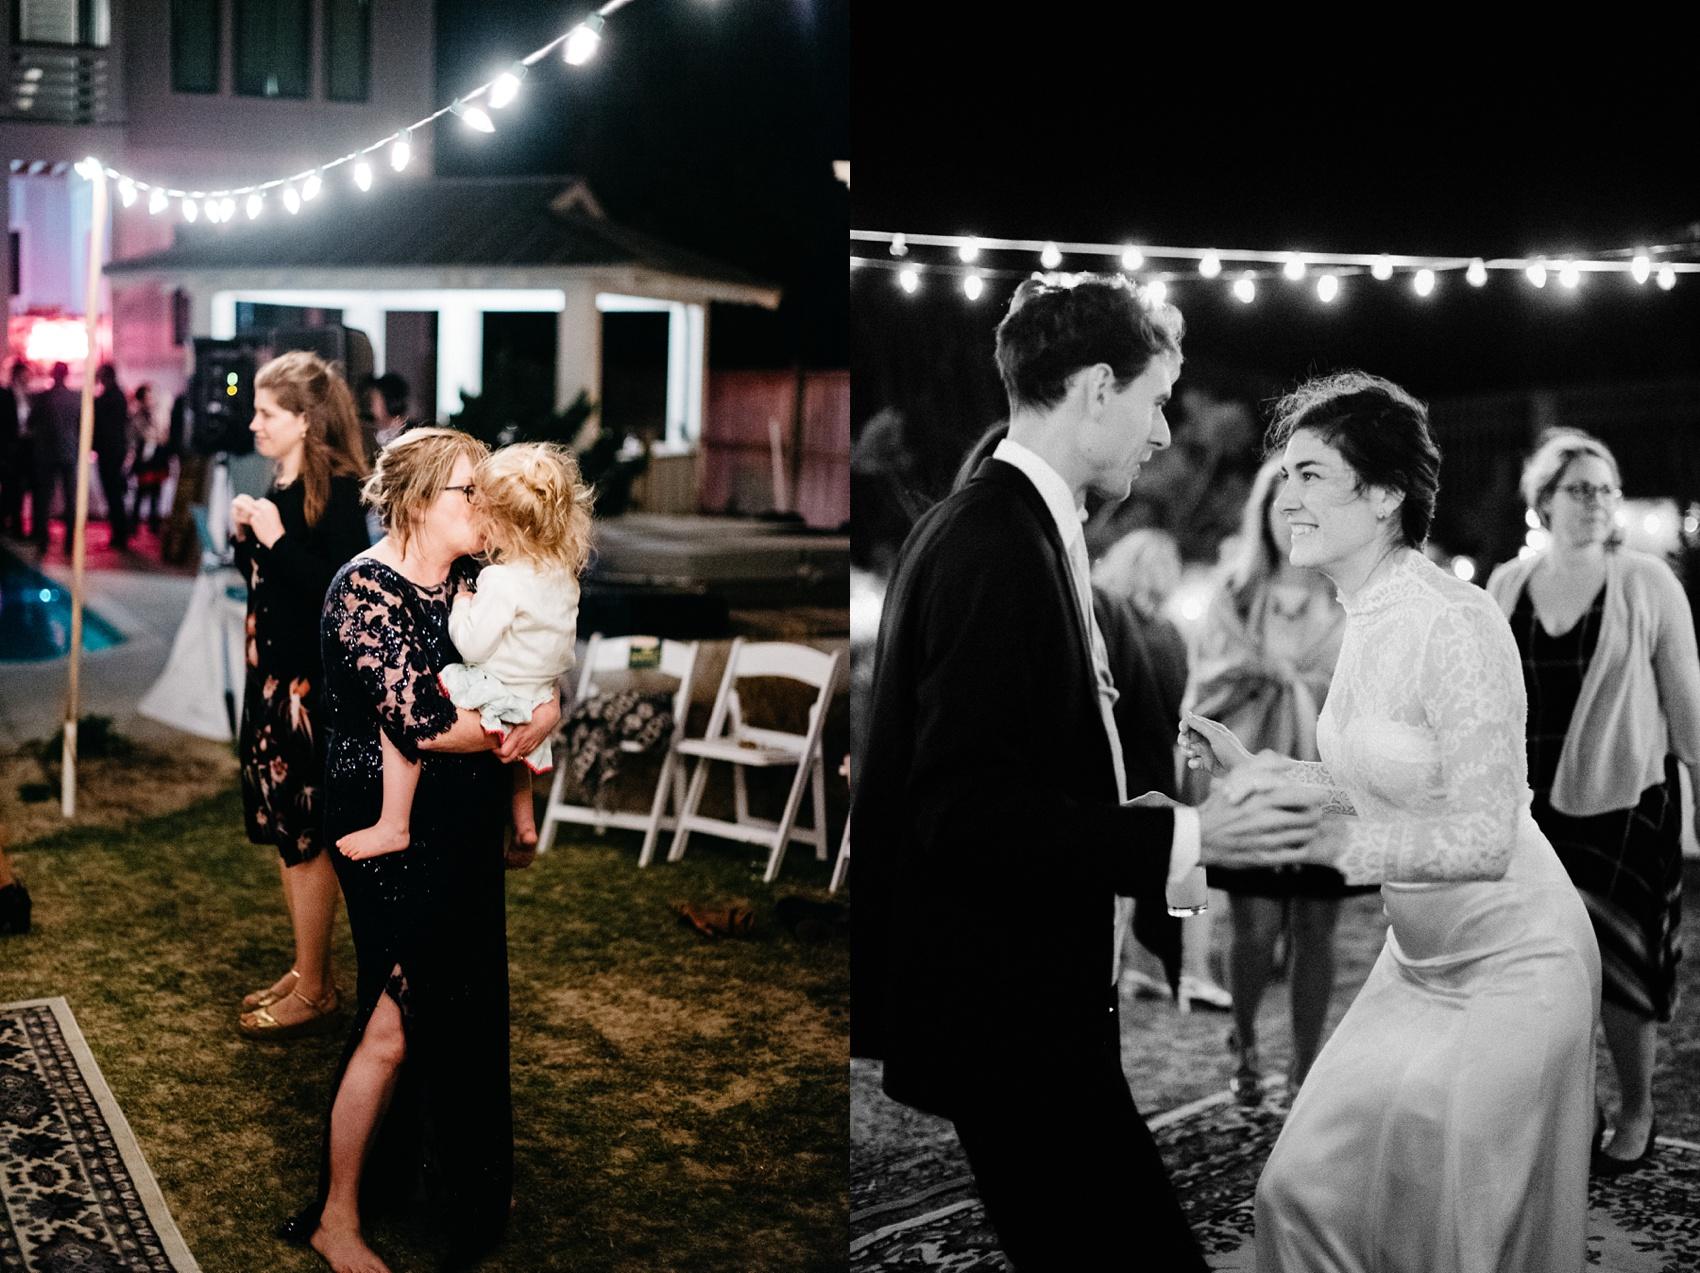 outerbanks_wedding_photographer_1352.jpg